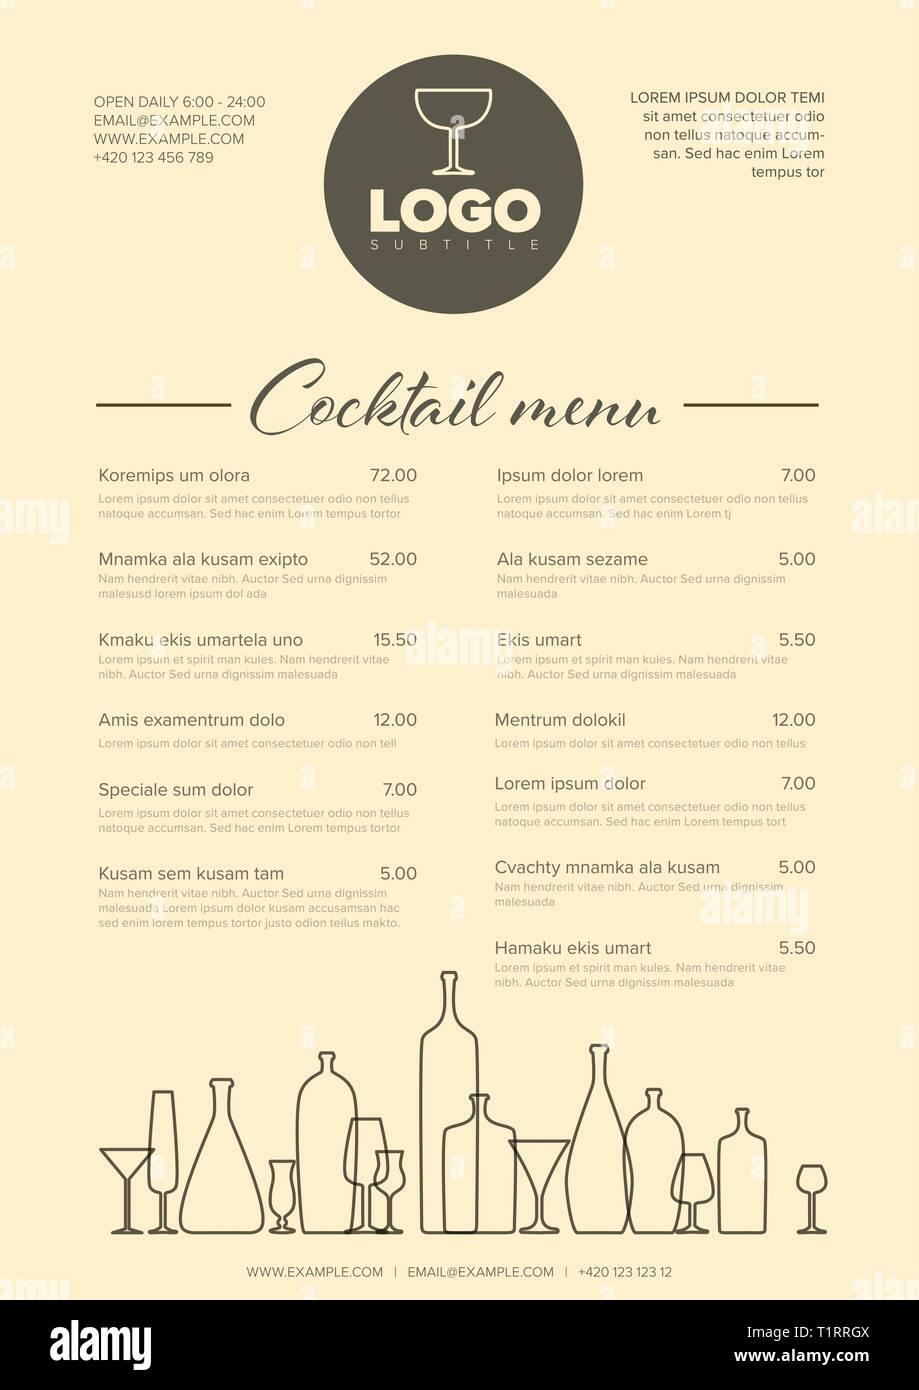 Cocktailkarte Google Suche リーフレット 蘿蔔糕 和 10